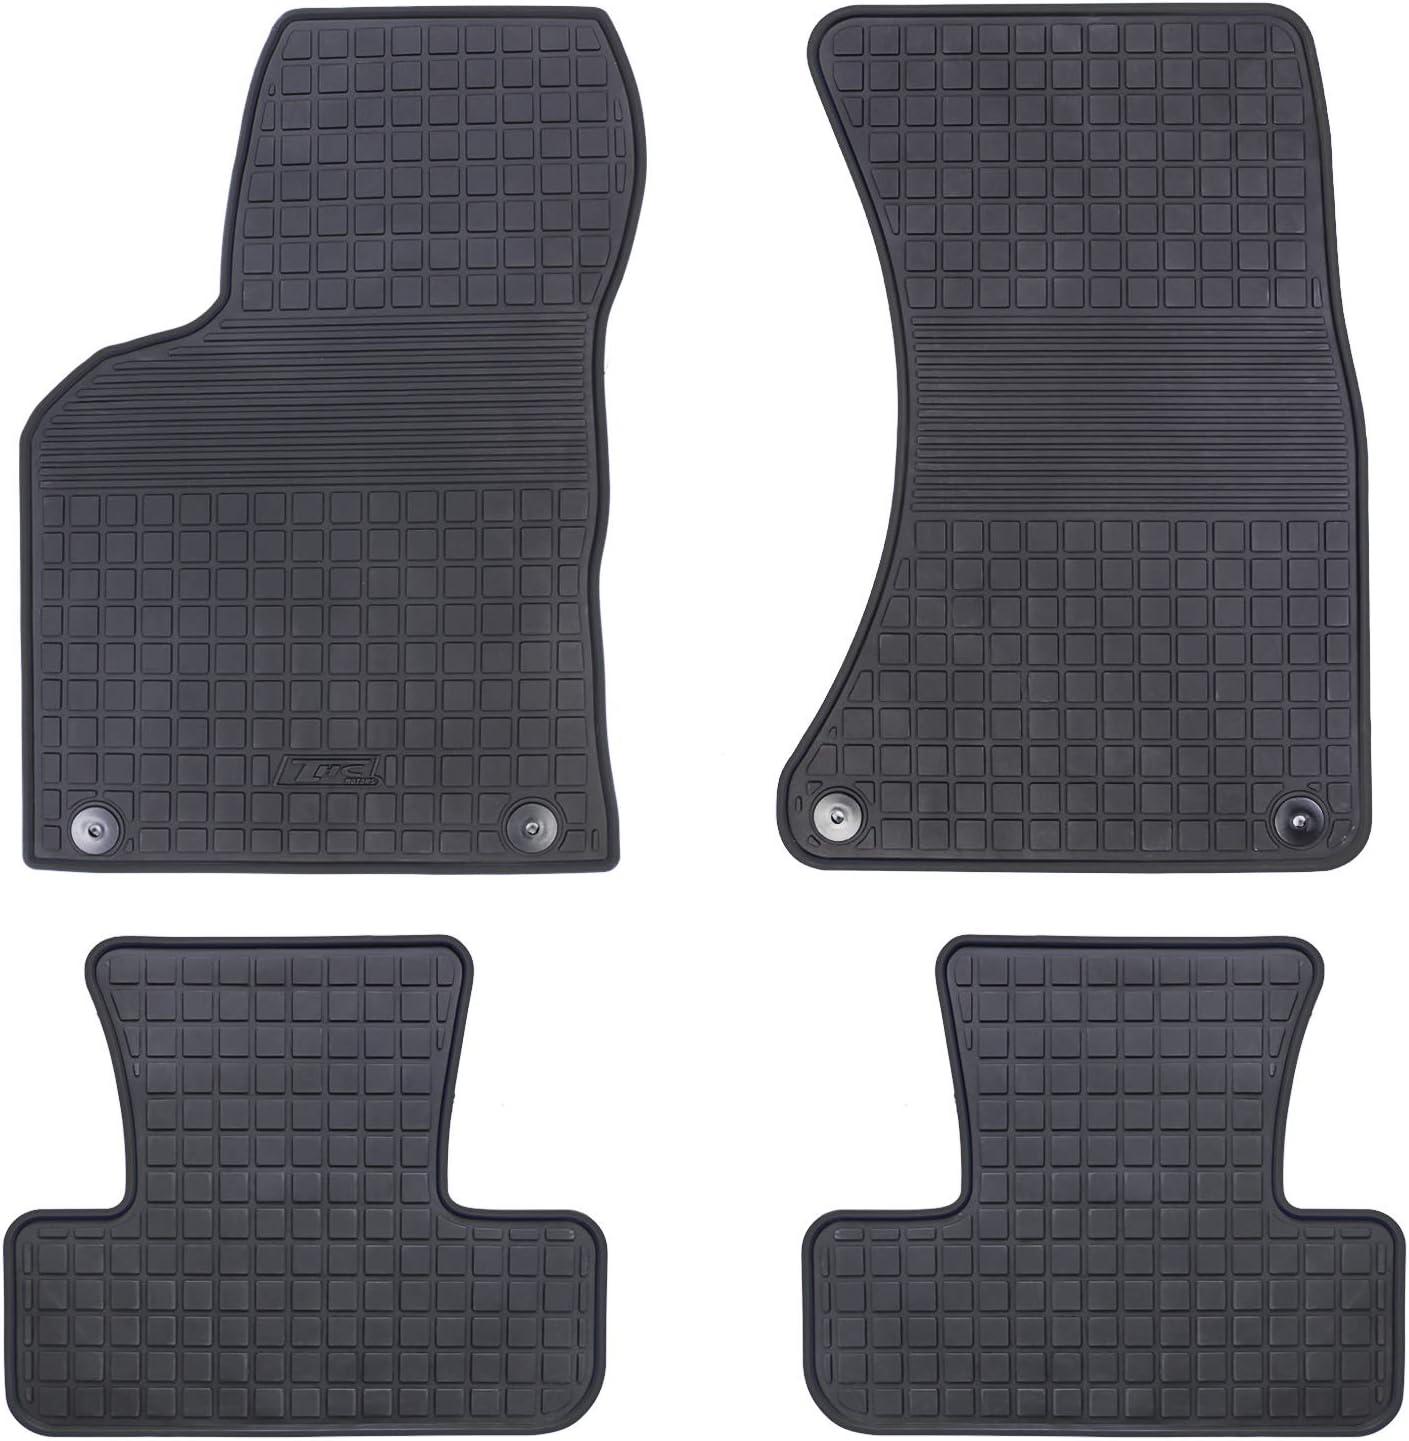 HD-Mart Car Floor Mat Rubber for Audi Q5 2018 2019 2020 Custom Fit Full Black Auto Floor Mats All Weather Heavy Duty /& Odorless